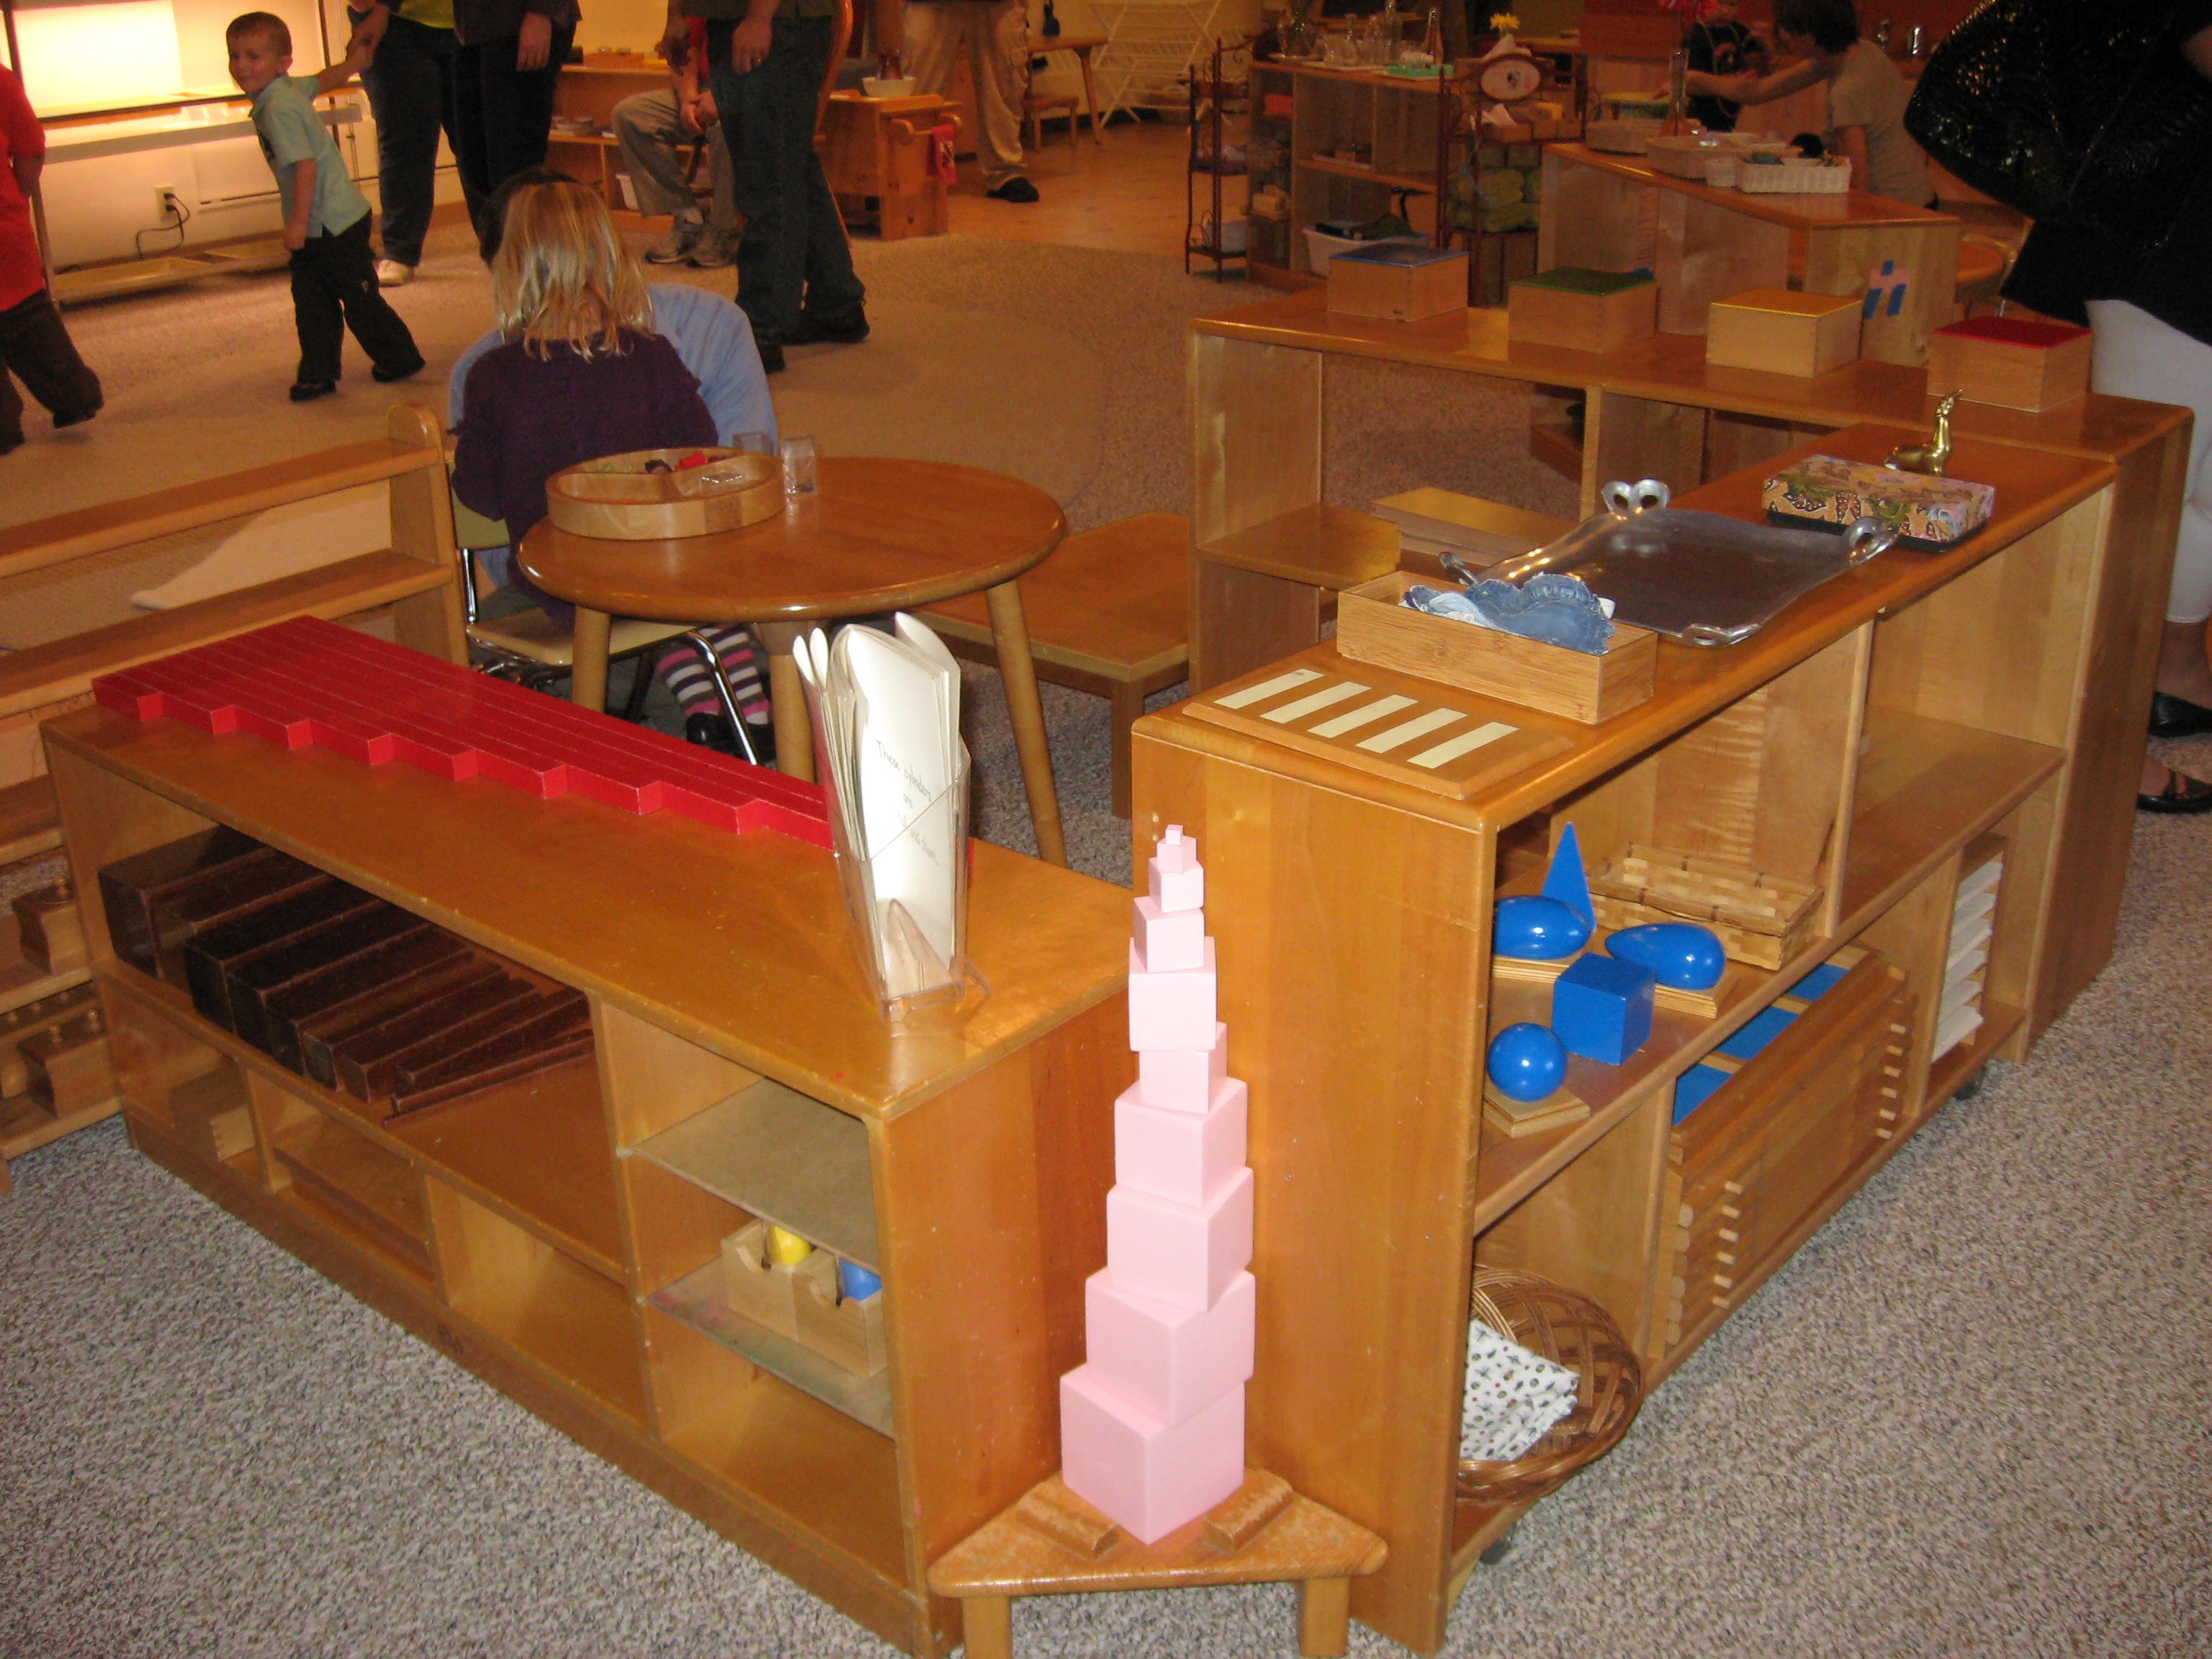 Maria montessori napkinwriter for Children s material